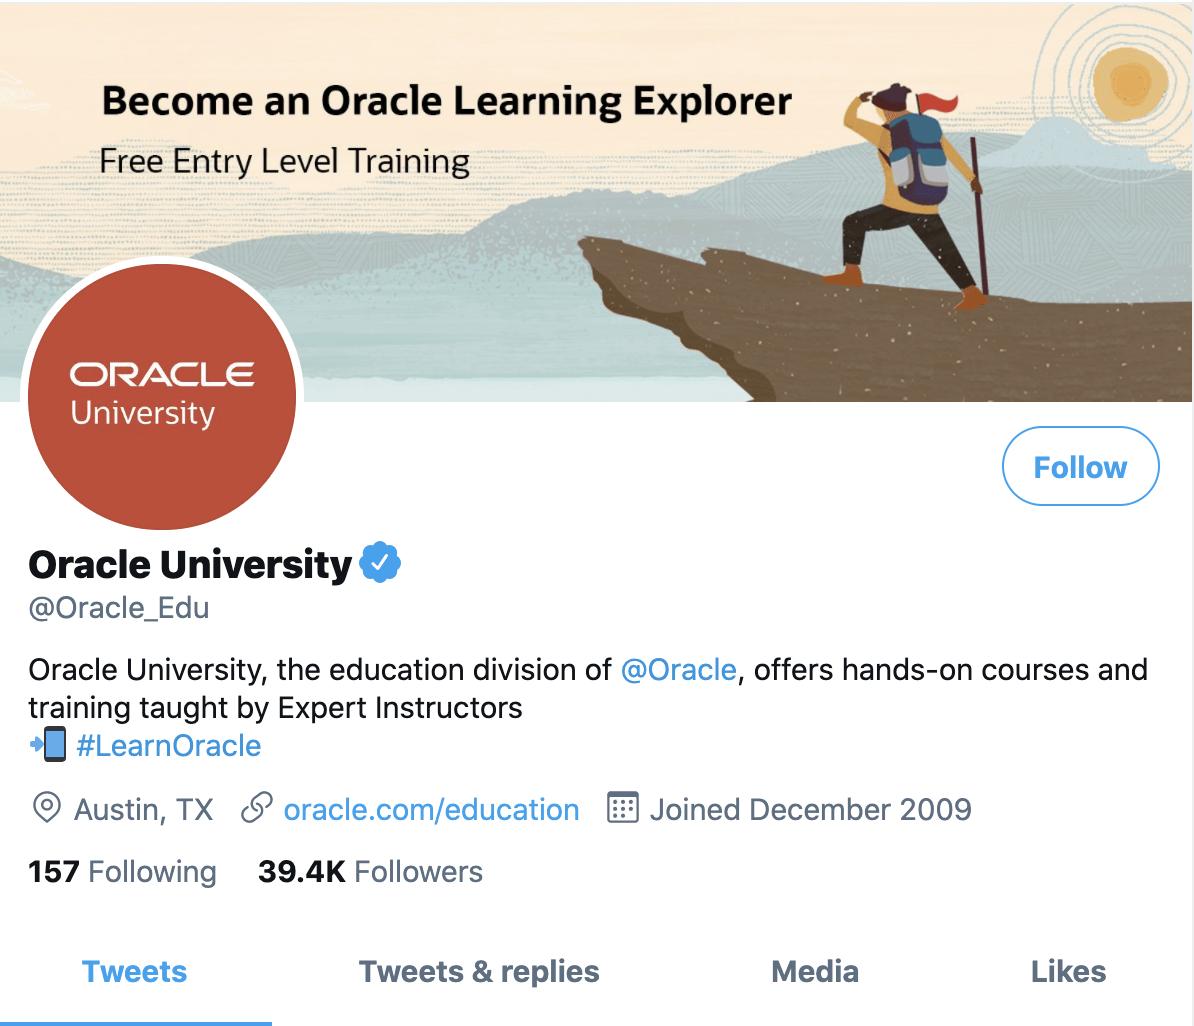 Oracle University Twitter handle